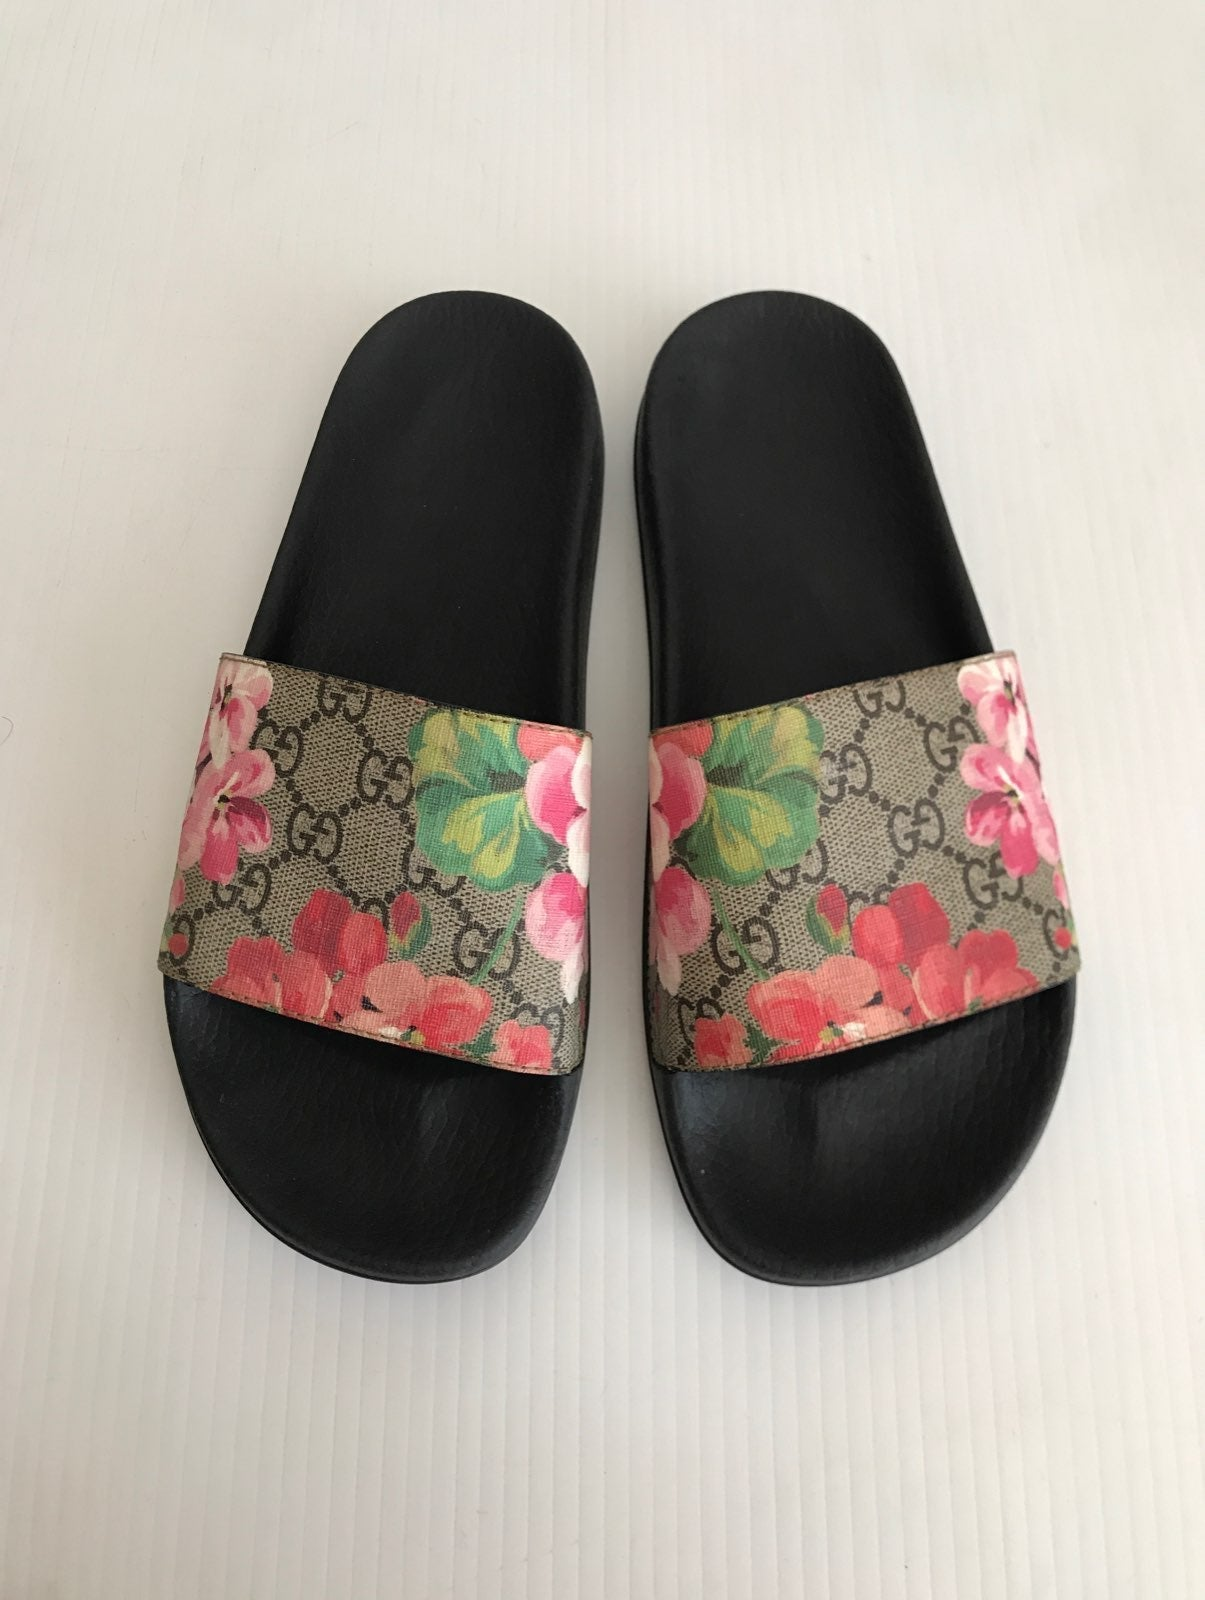 Gucci GG Bloom Pursuit Slide Sandal 39